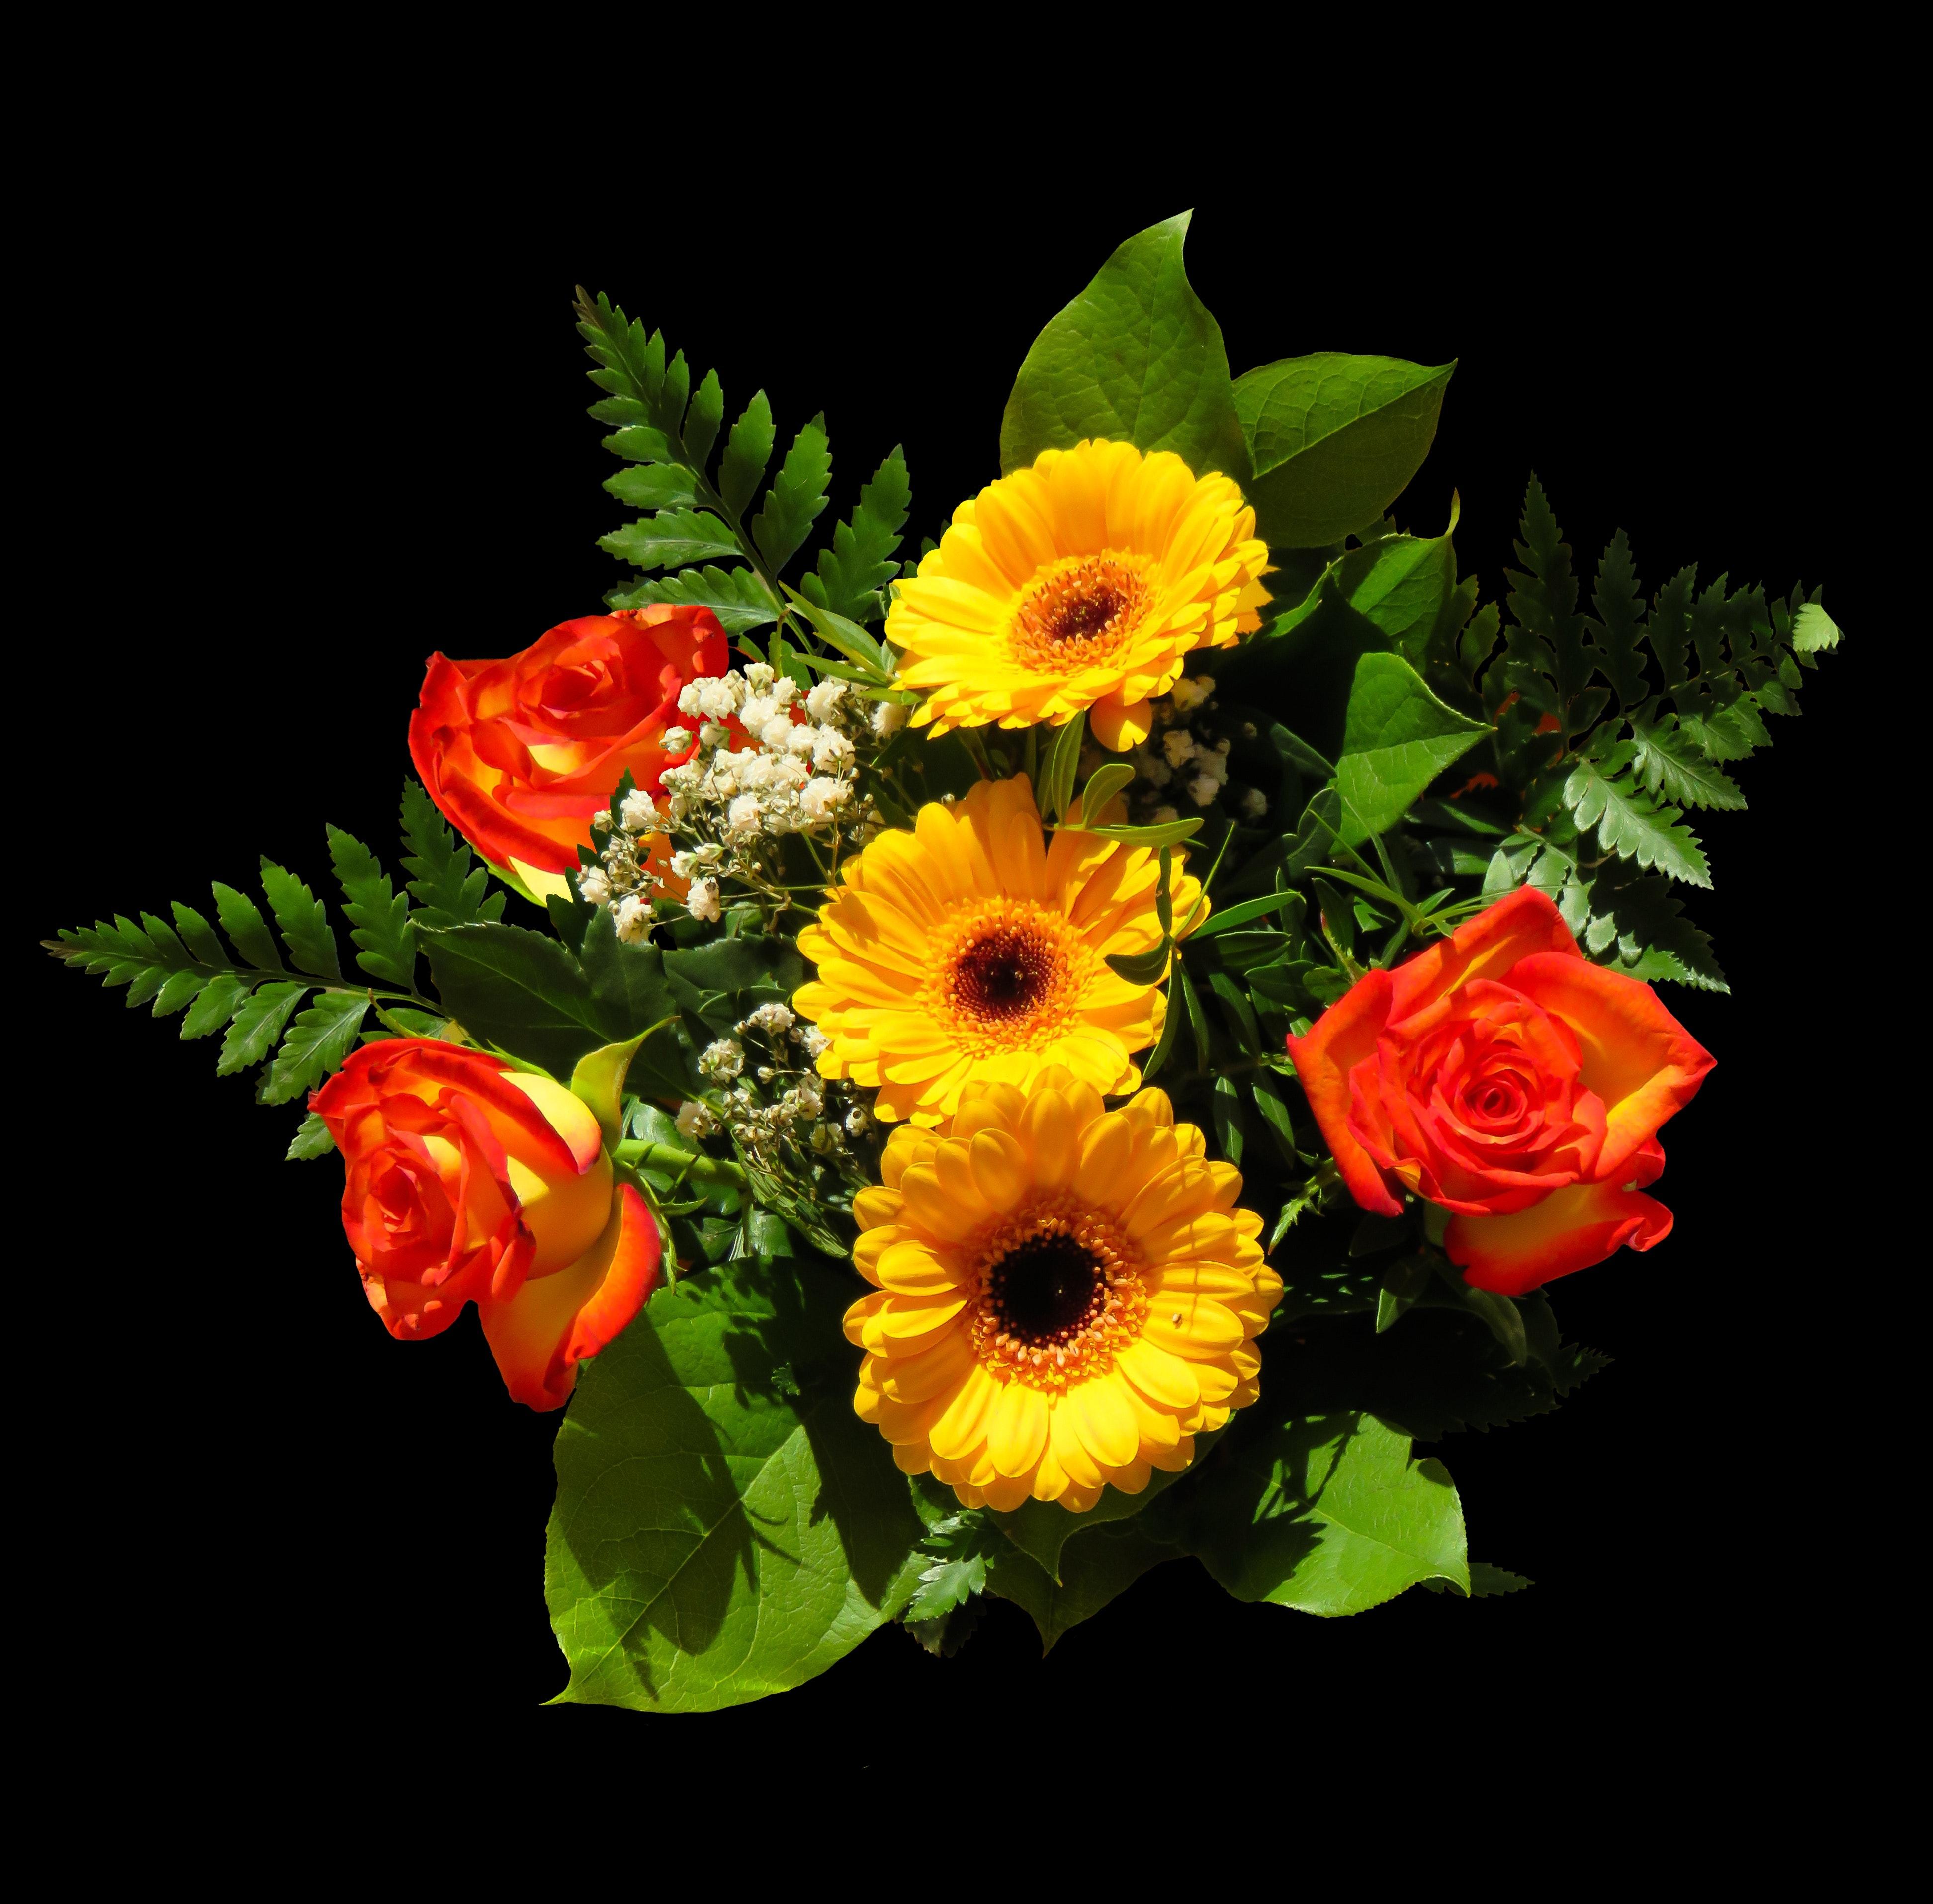 Free stock photo of birthday bouquet bouquet flowers free download izmirmasajfo